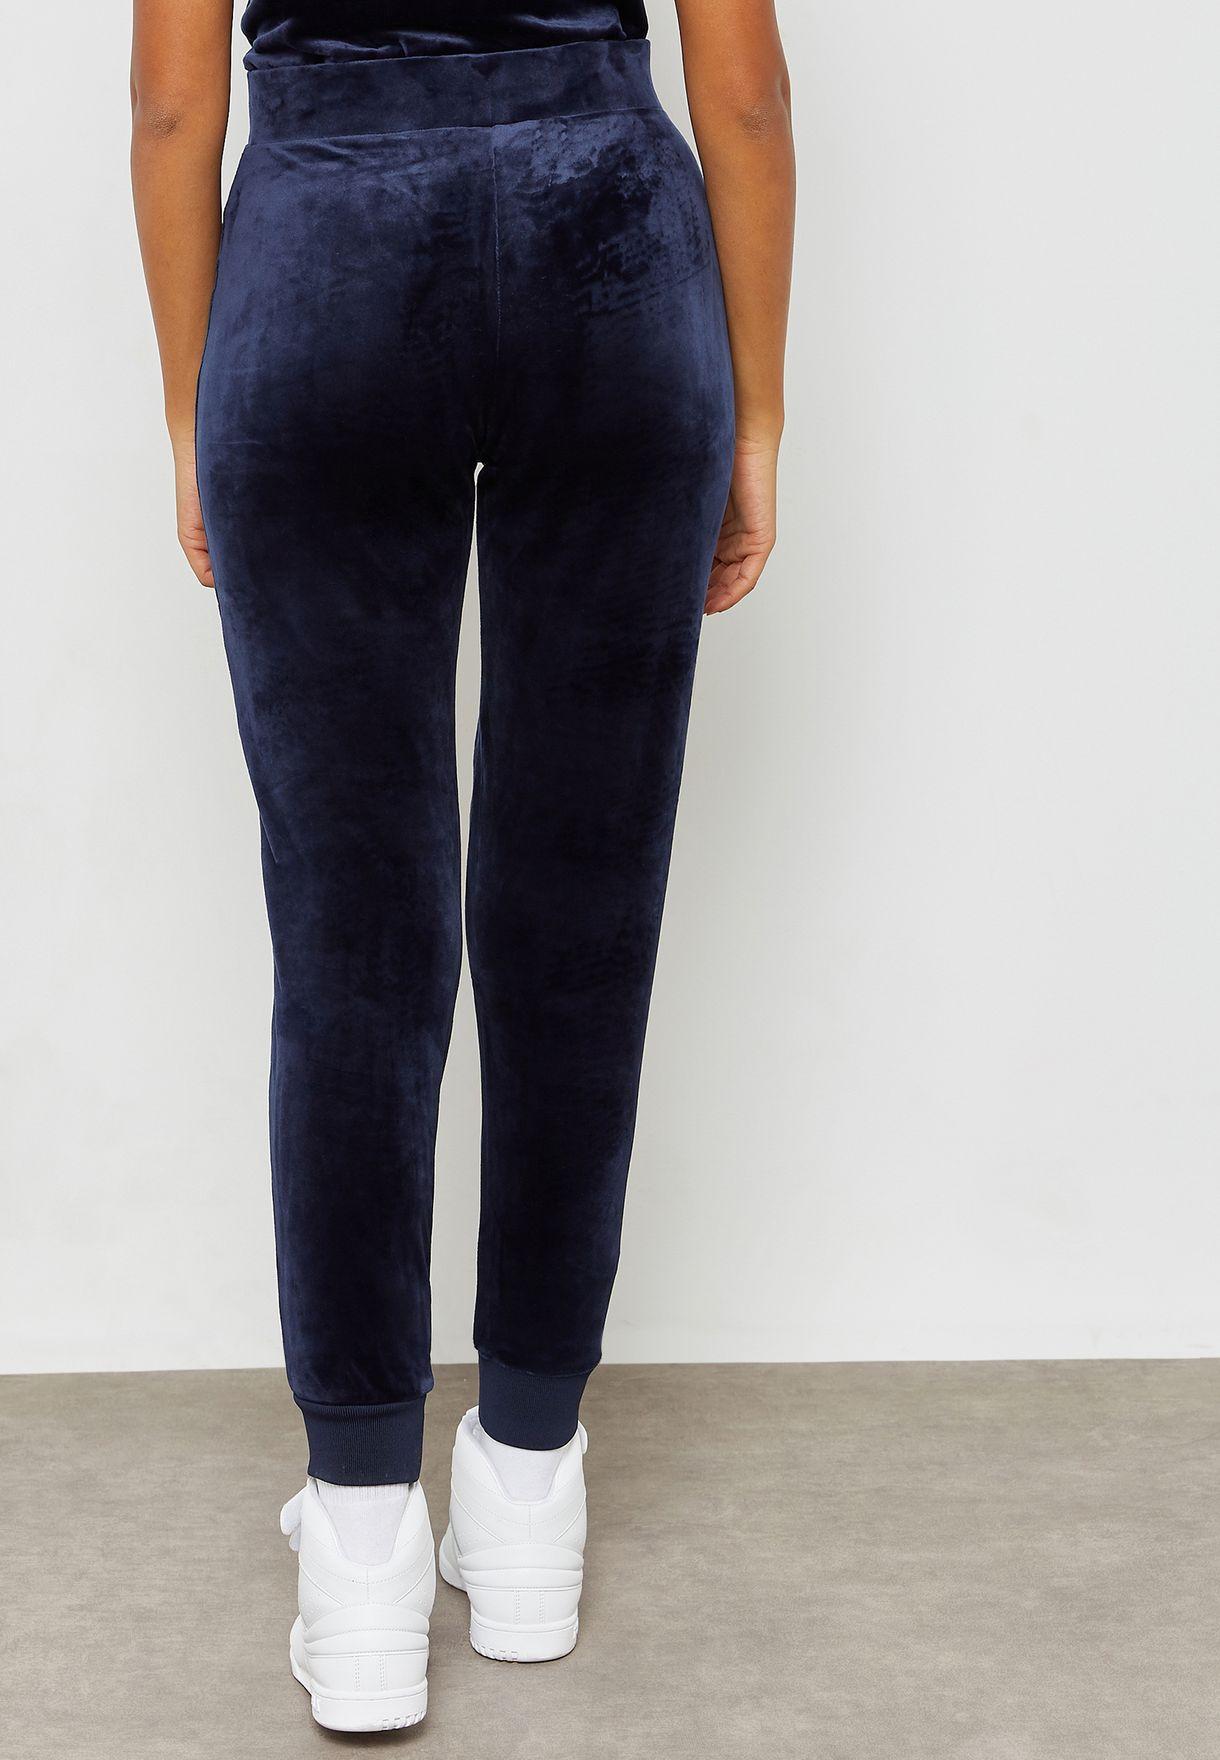 e92744be Shop Fila navy Sara Velour Sweatpants LW183Y76-410 for Women in ...